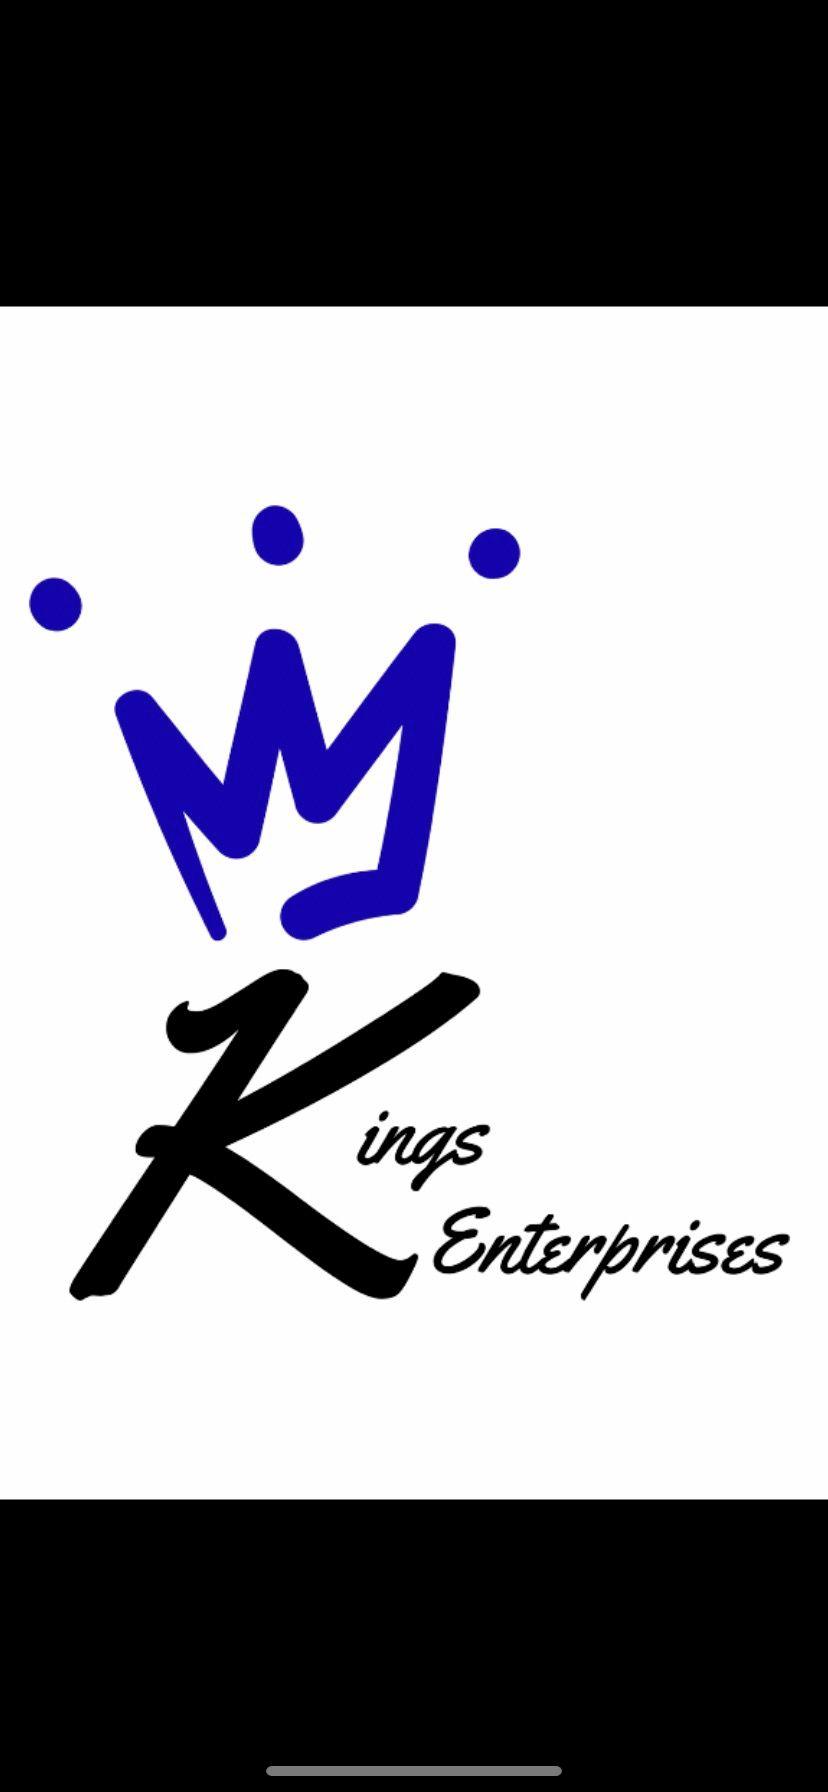 Kings Enterprises